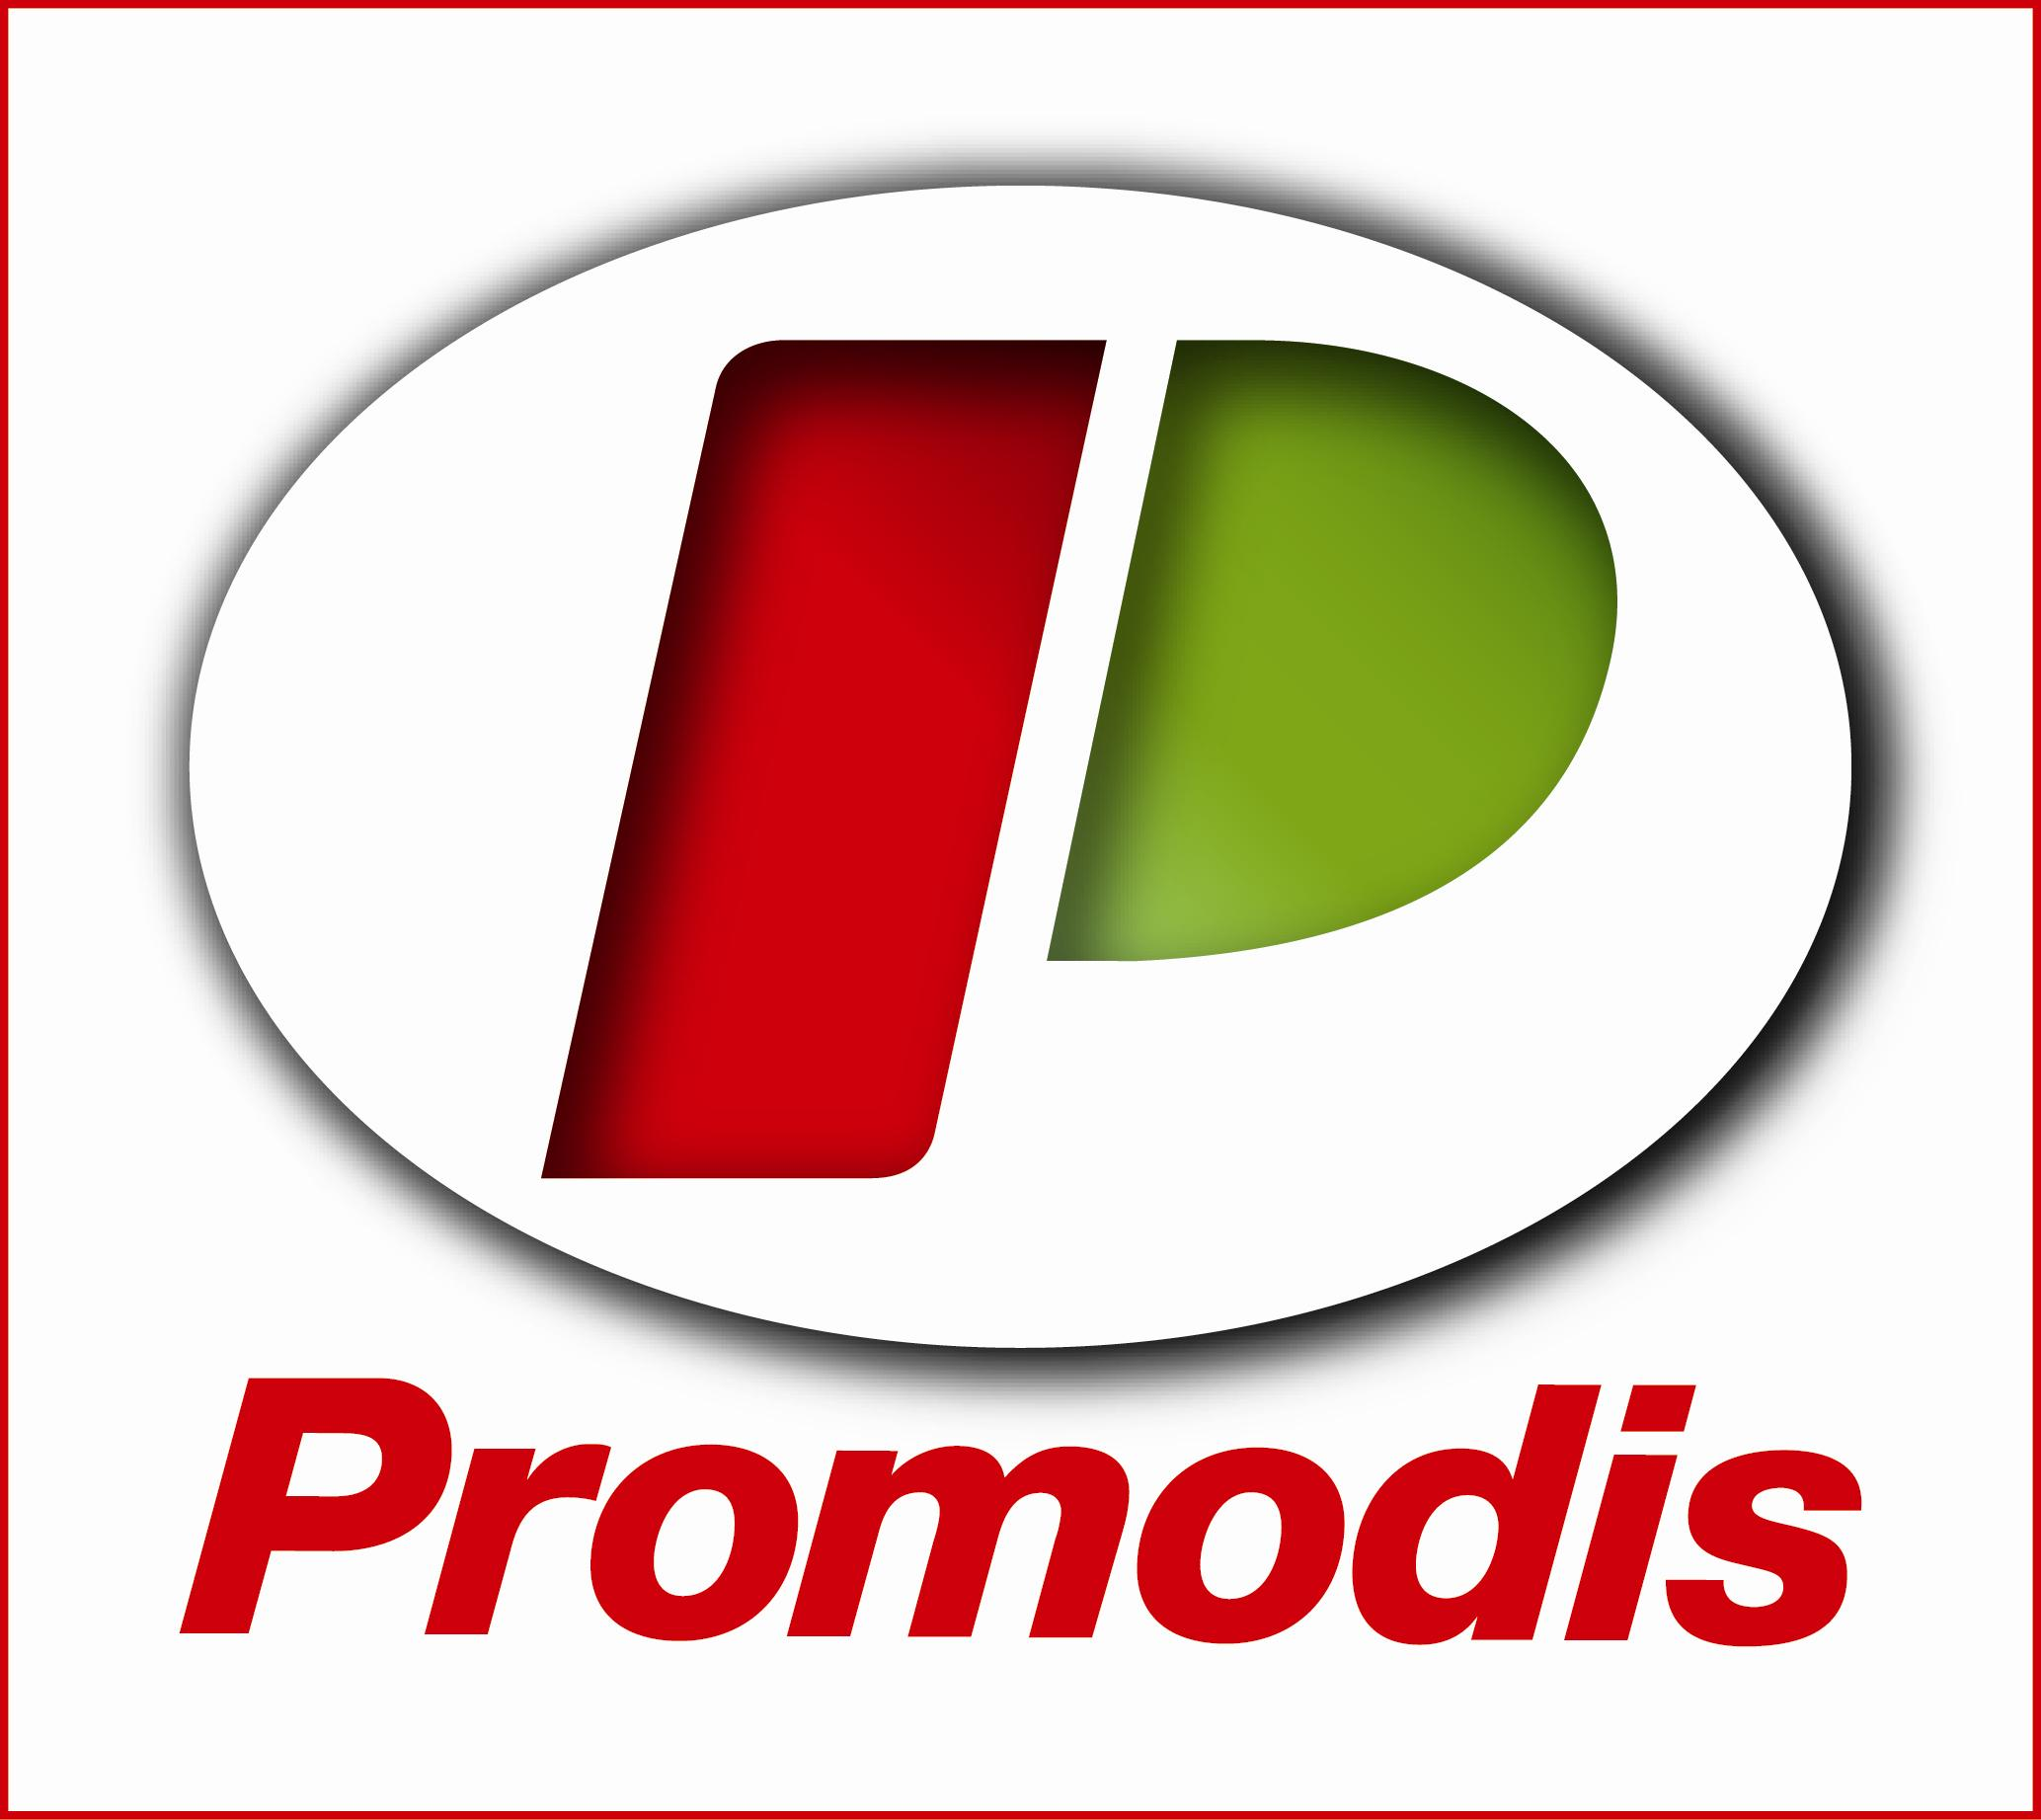 logo-promodis